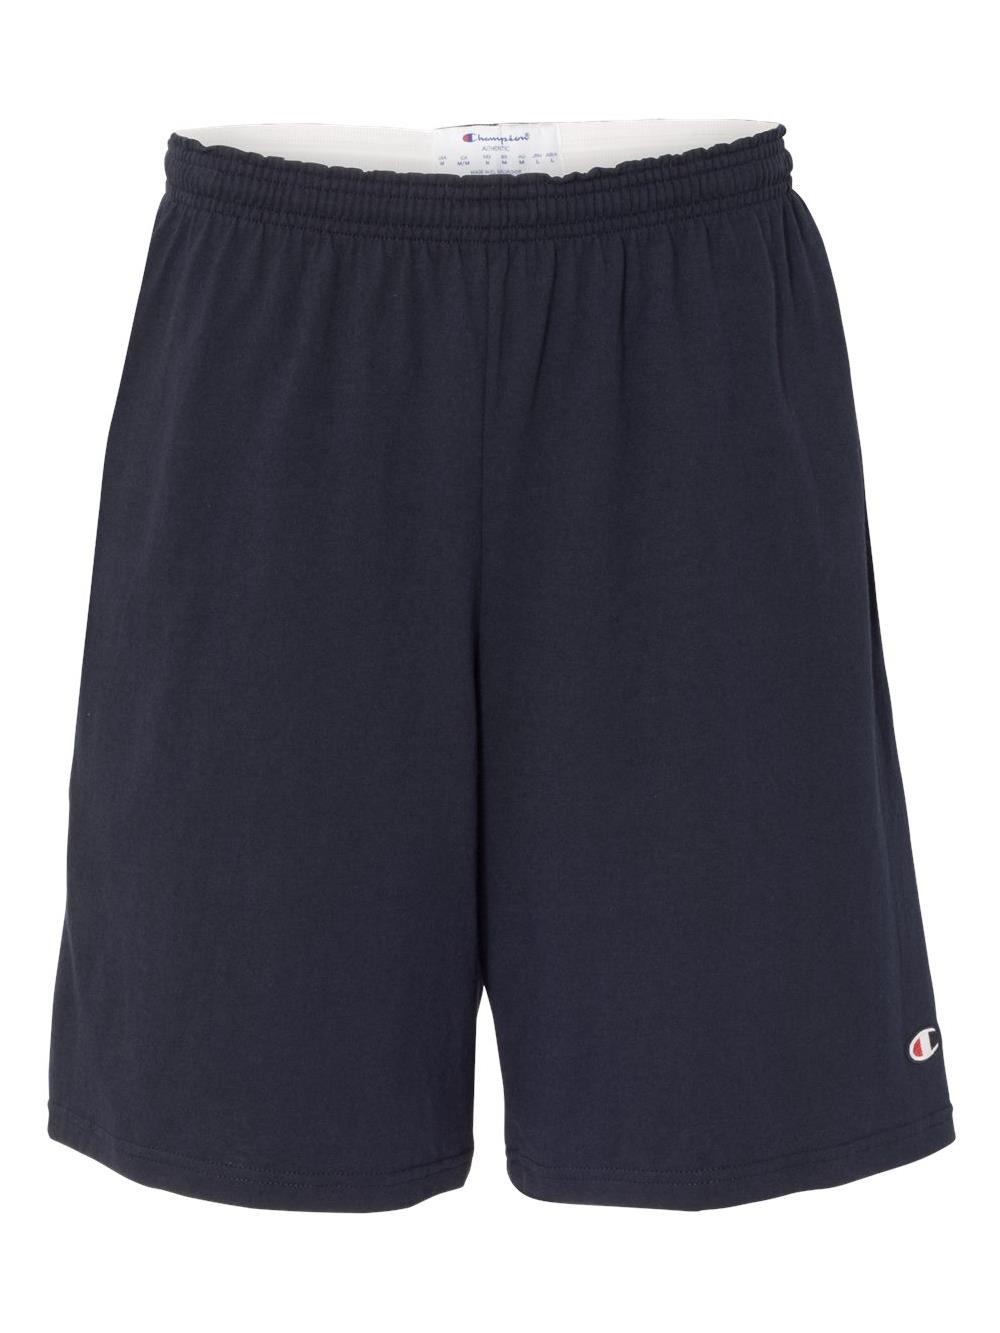 "Champion Athletics 9"" Inseam Cotton Jersey Shorts with Pockets 8180"